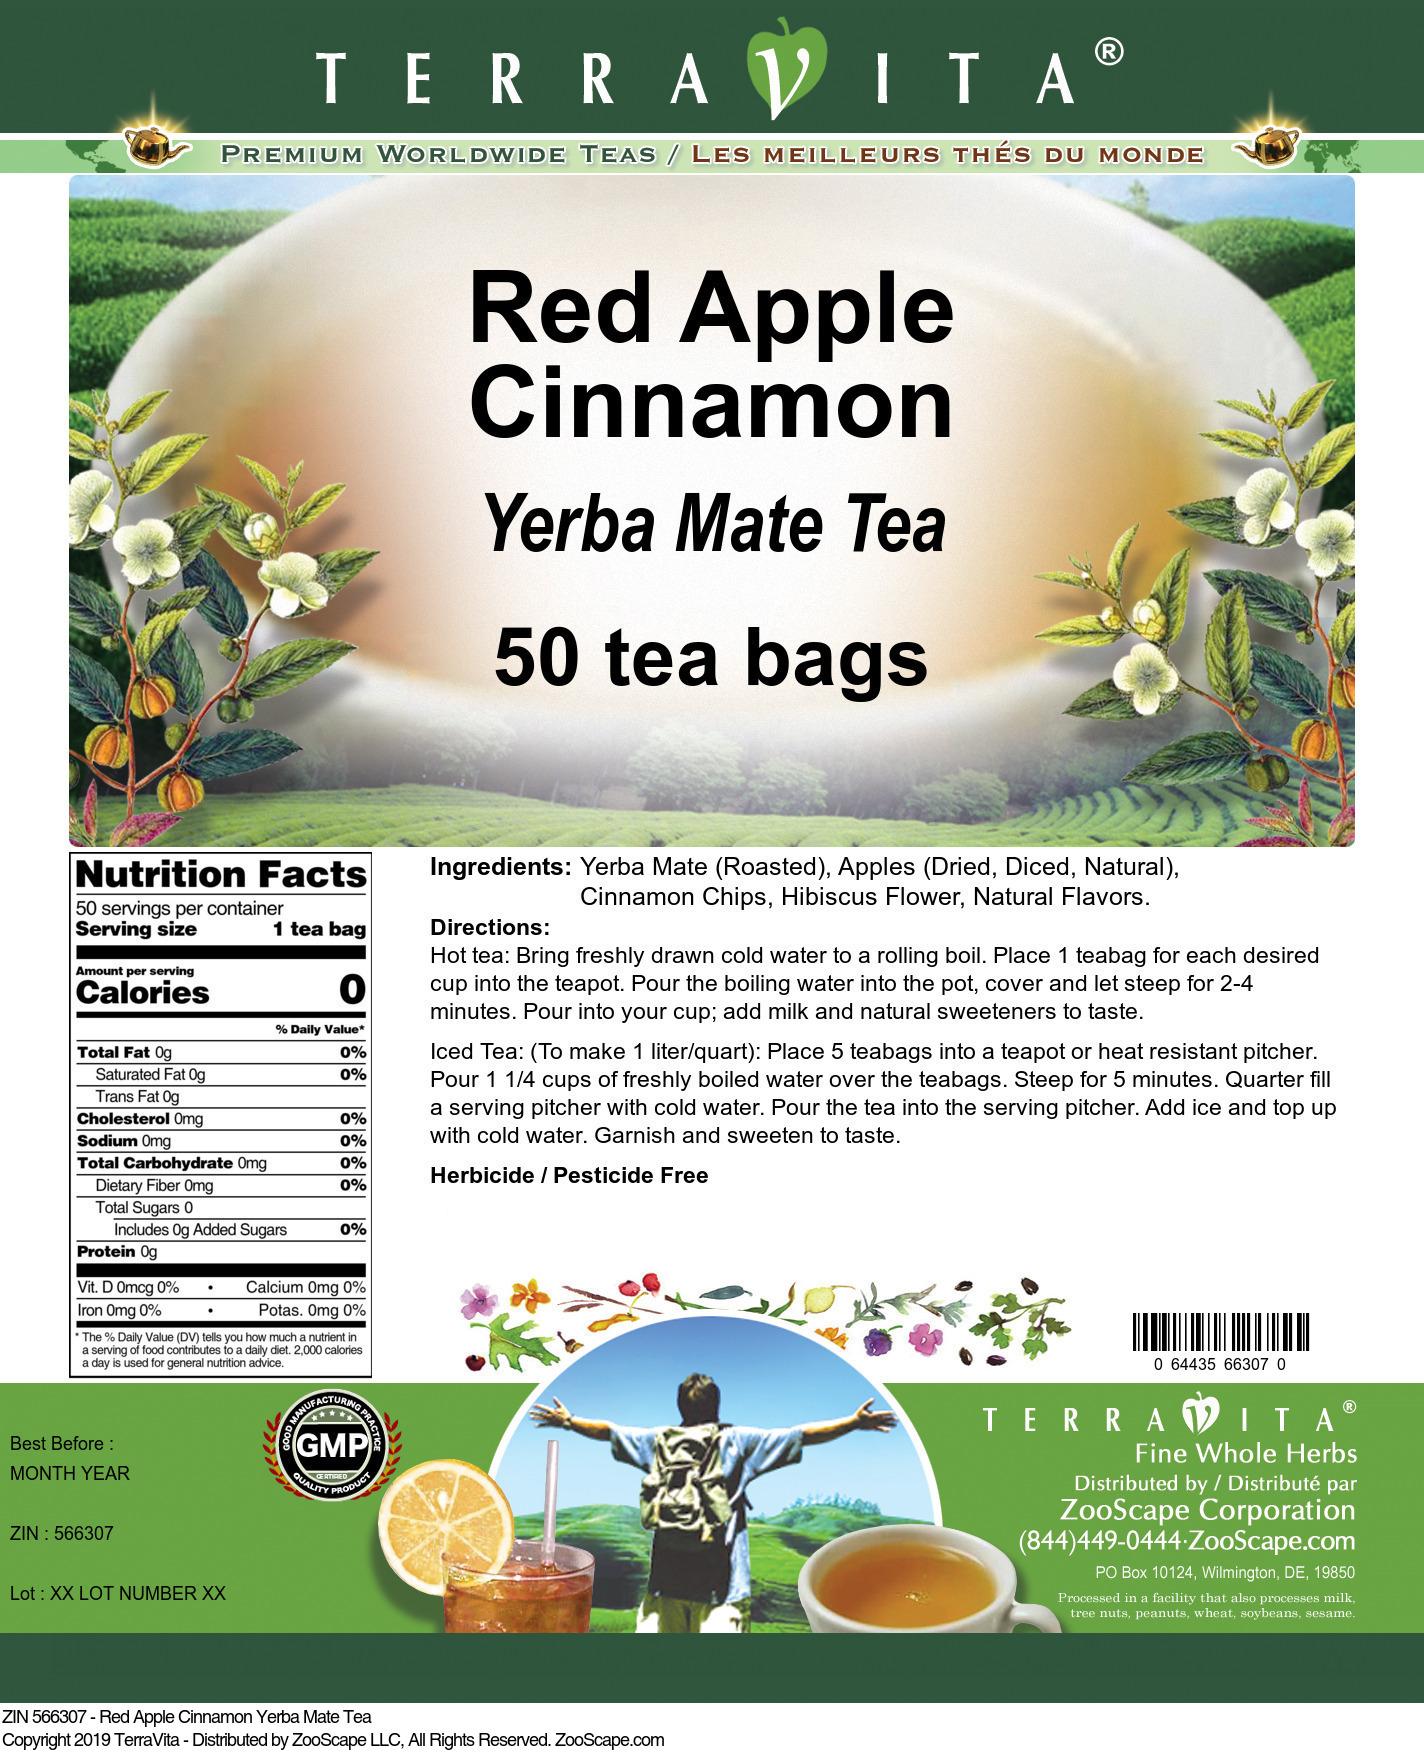 Red Apple Cinnamon Yerba Mate